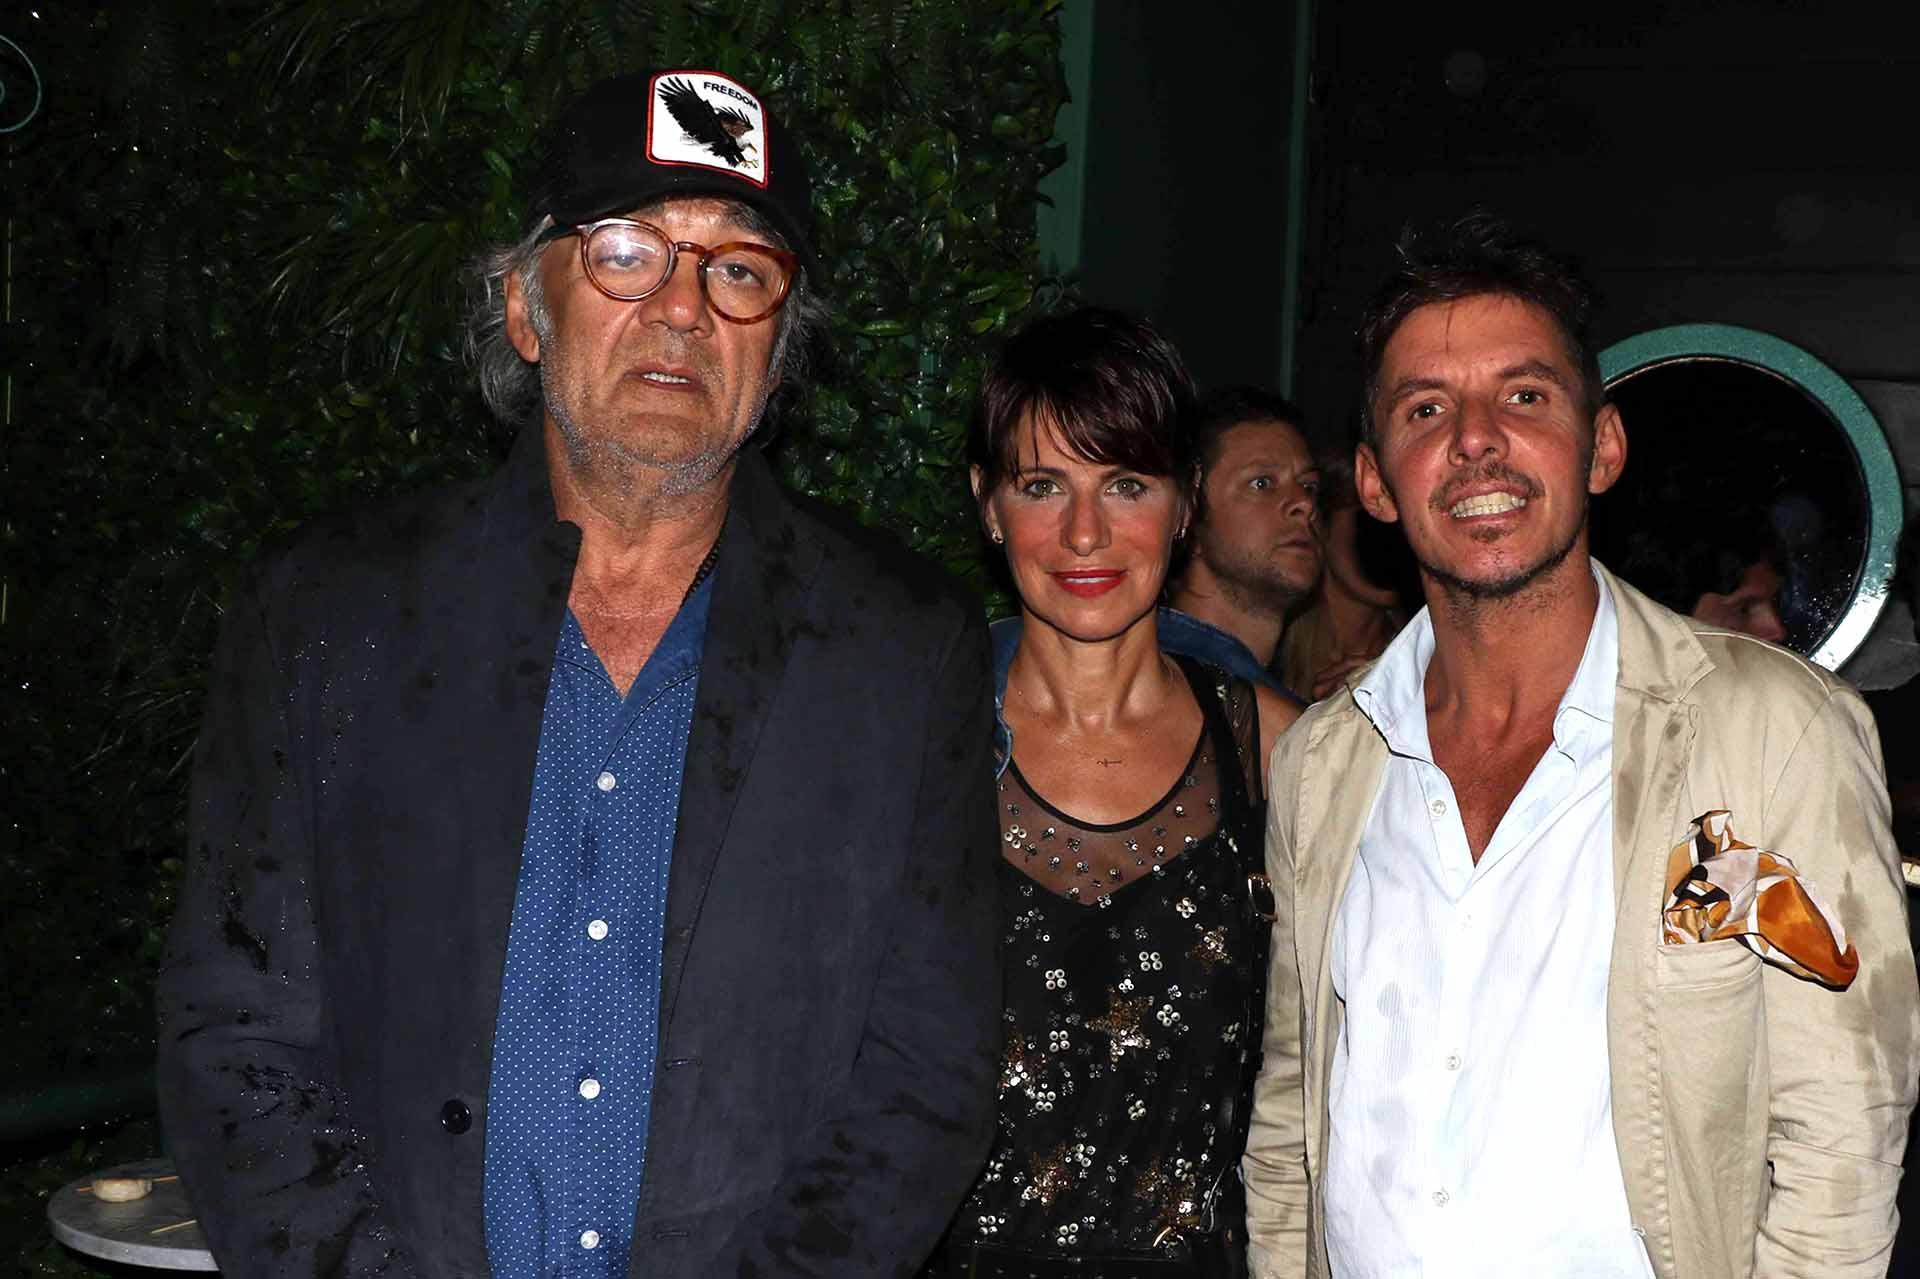 Osvaldo Brucco, Paola Pravato y Gerard Confalonieri